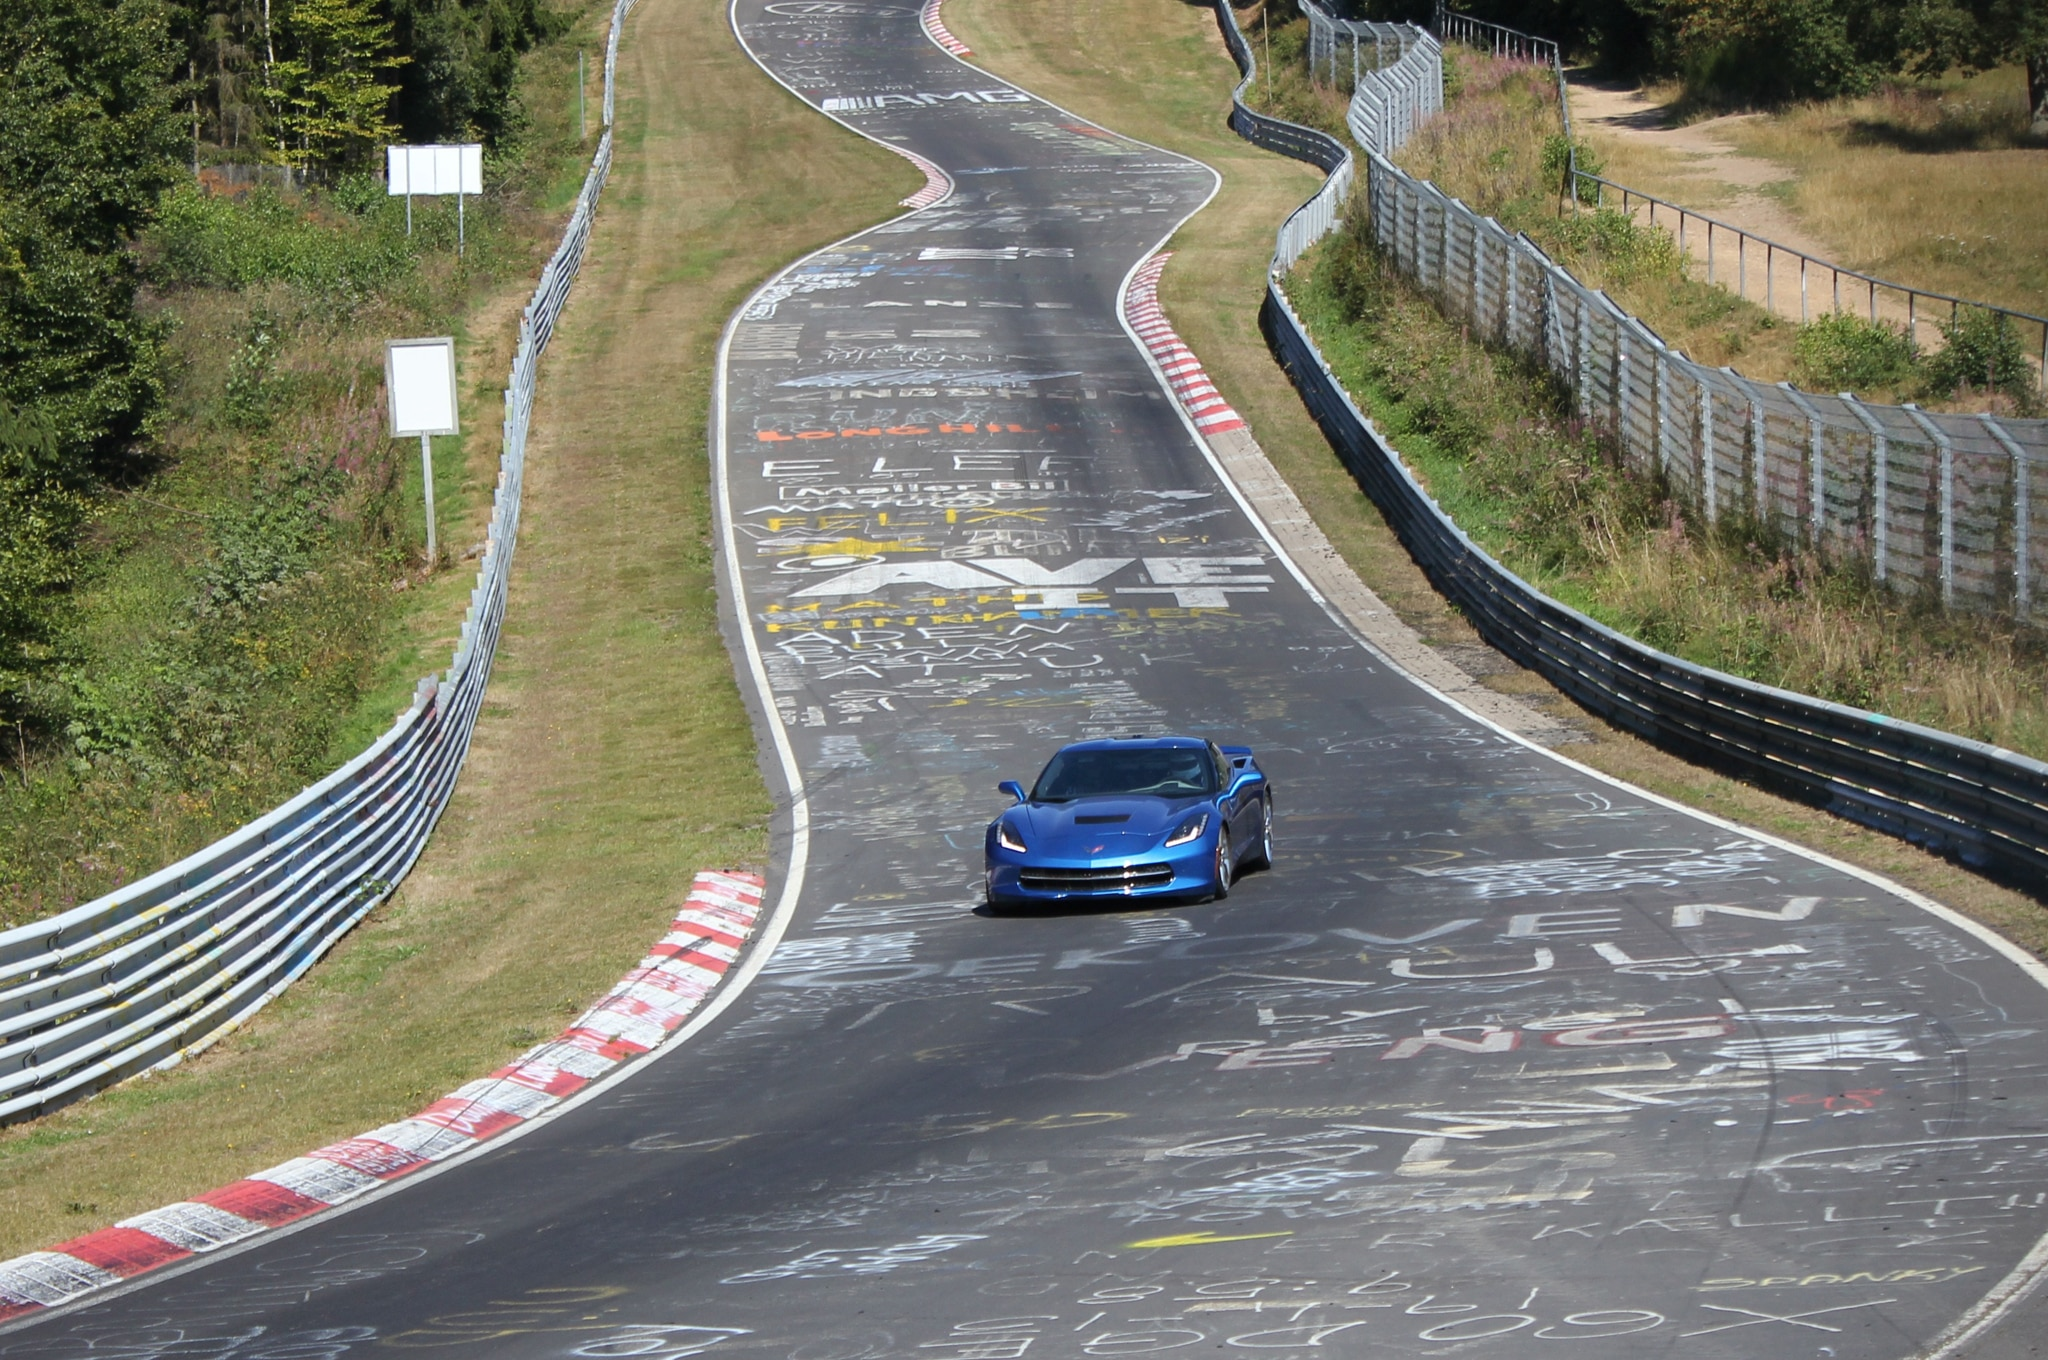 2014 Chevrolet Corvette Stingray Euro Market Testing On Nurburgring Left Front 2